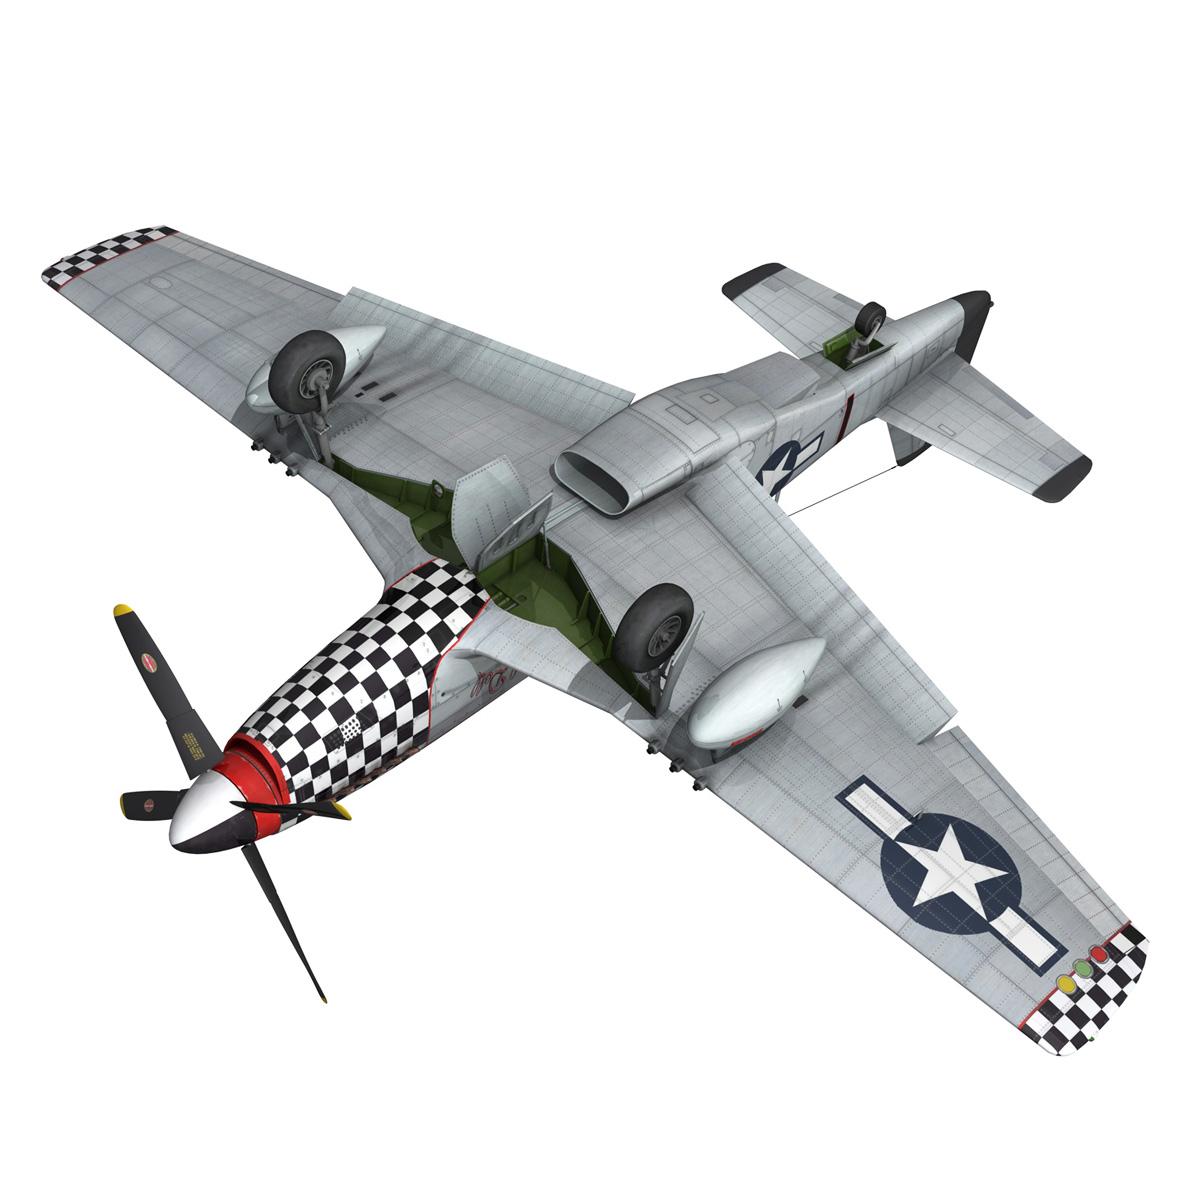 north american p-51d mustang – big beautiful doll 3d model fbx c4d lwo obj 282568